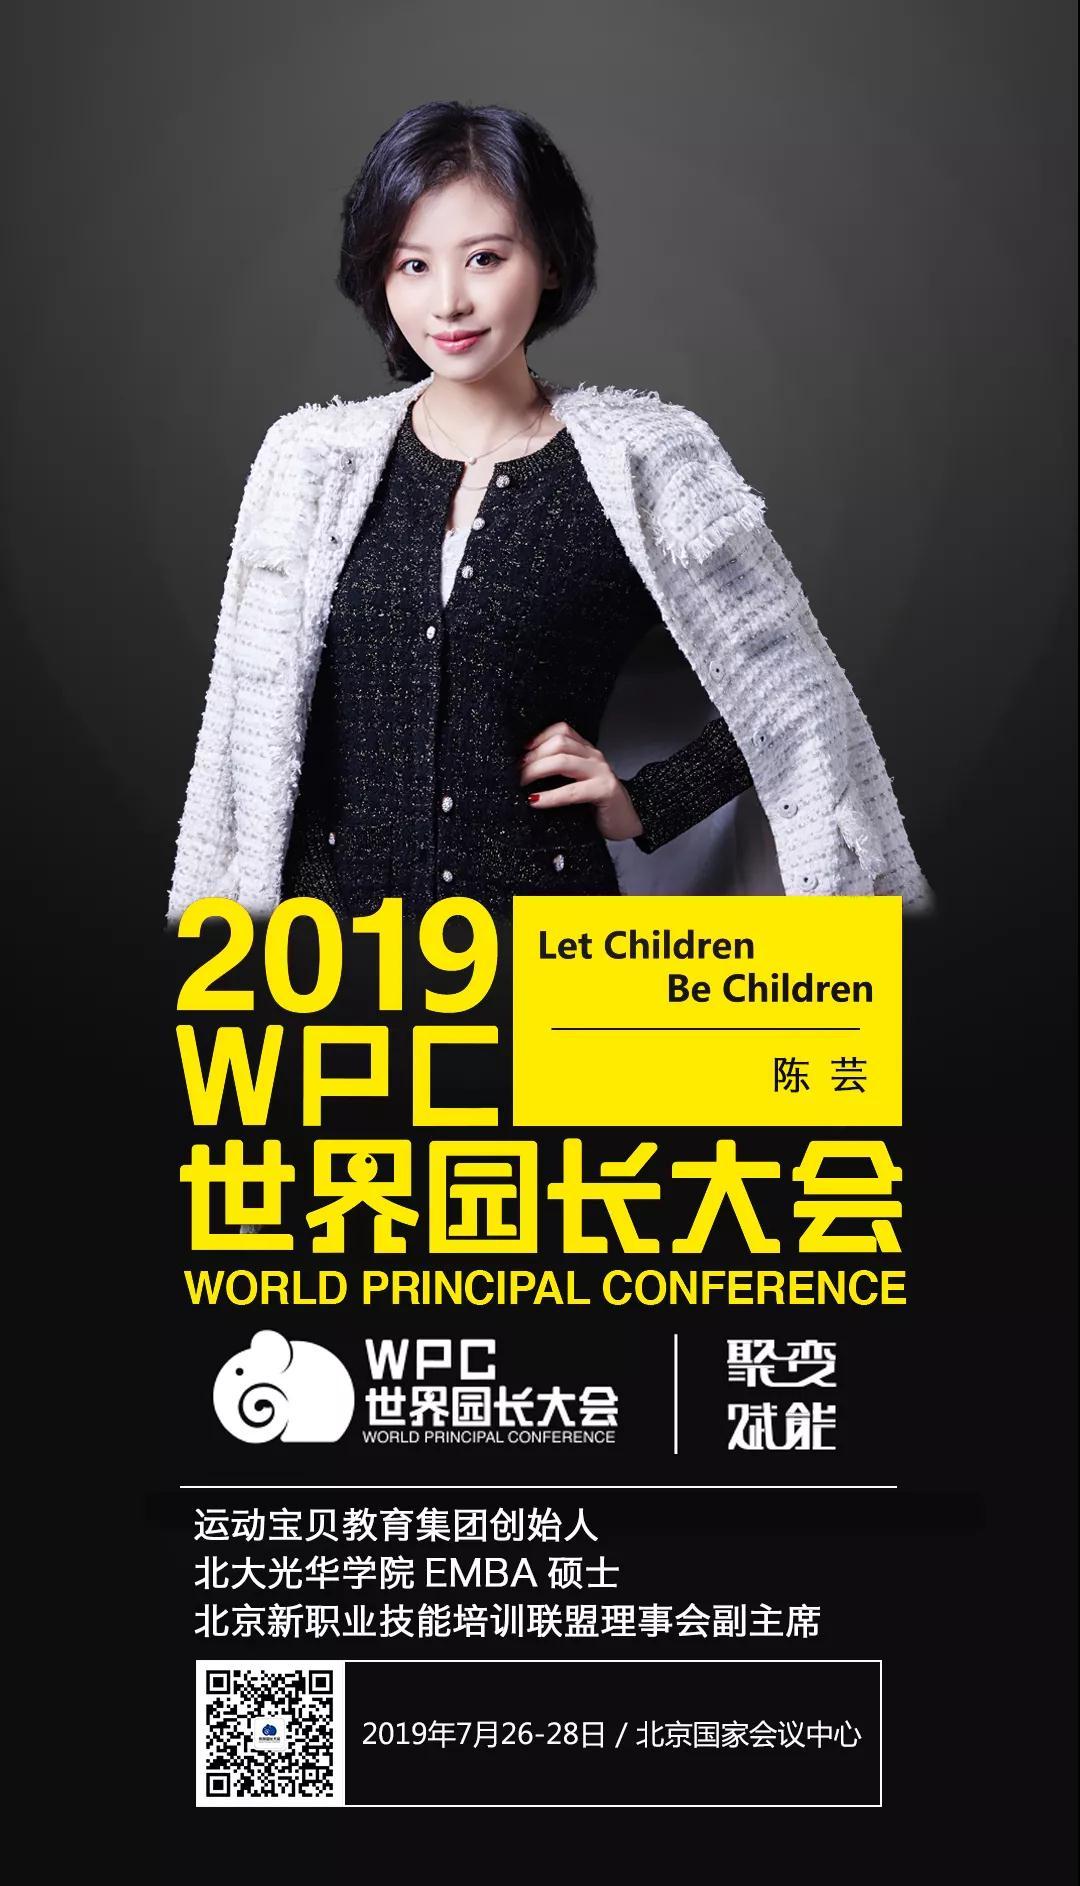 2019WPC世界园长大会 | 运动宝贝CEO陈芸受邀参加,将与世界前沿教育专家进行深度对话